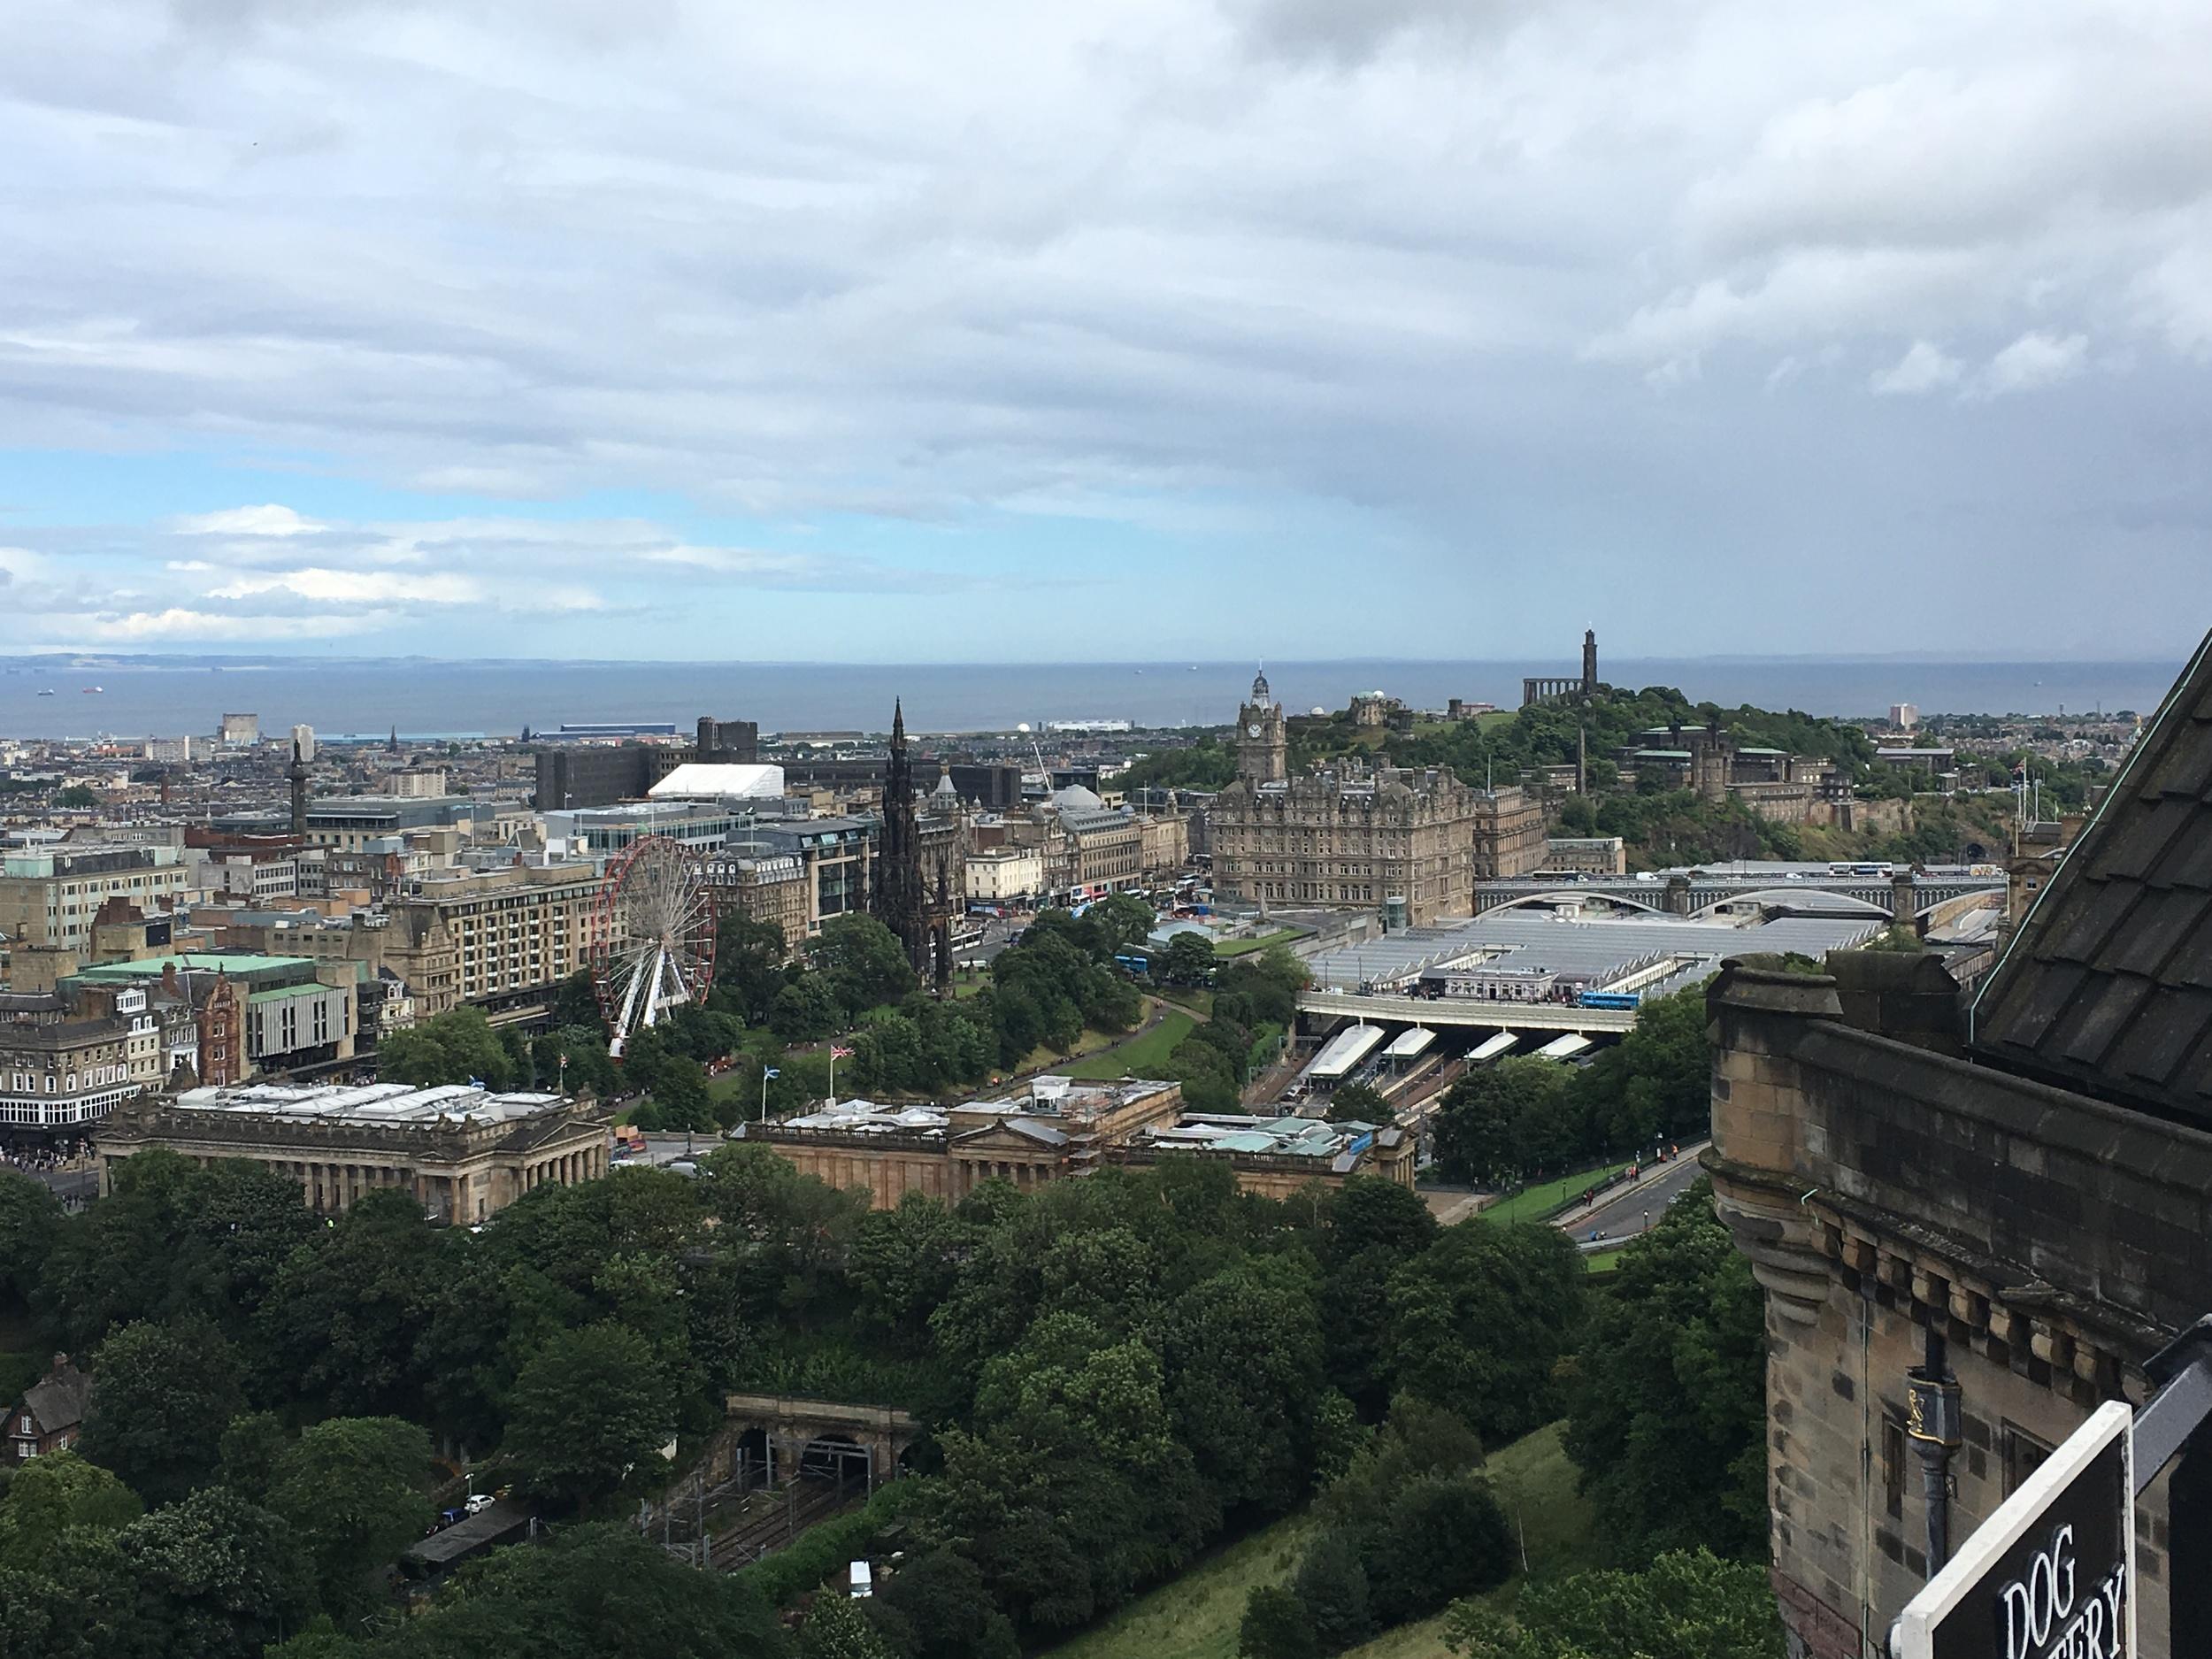 View from Edinburgh Castle Ramparts